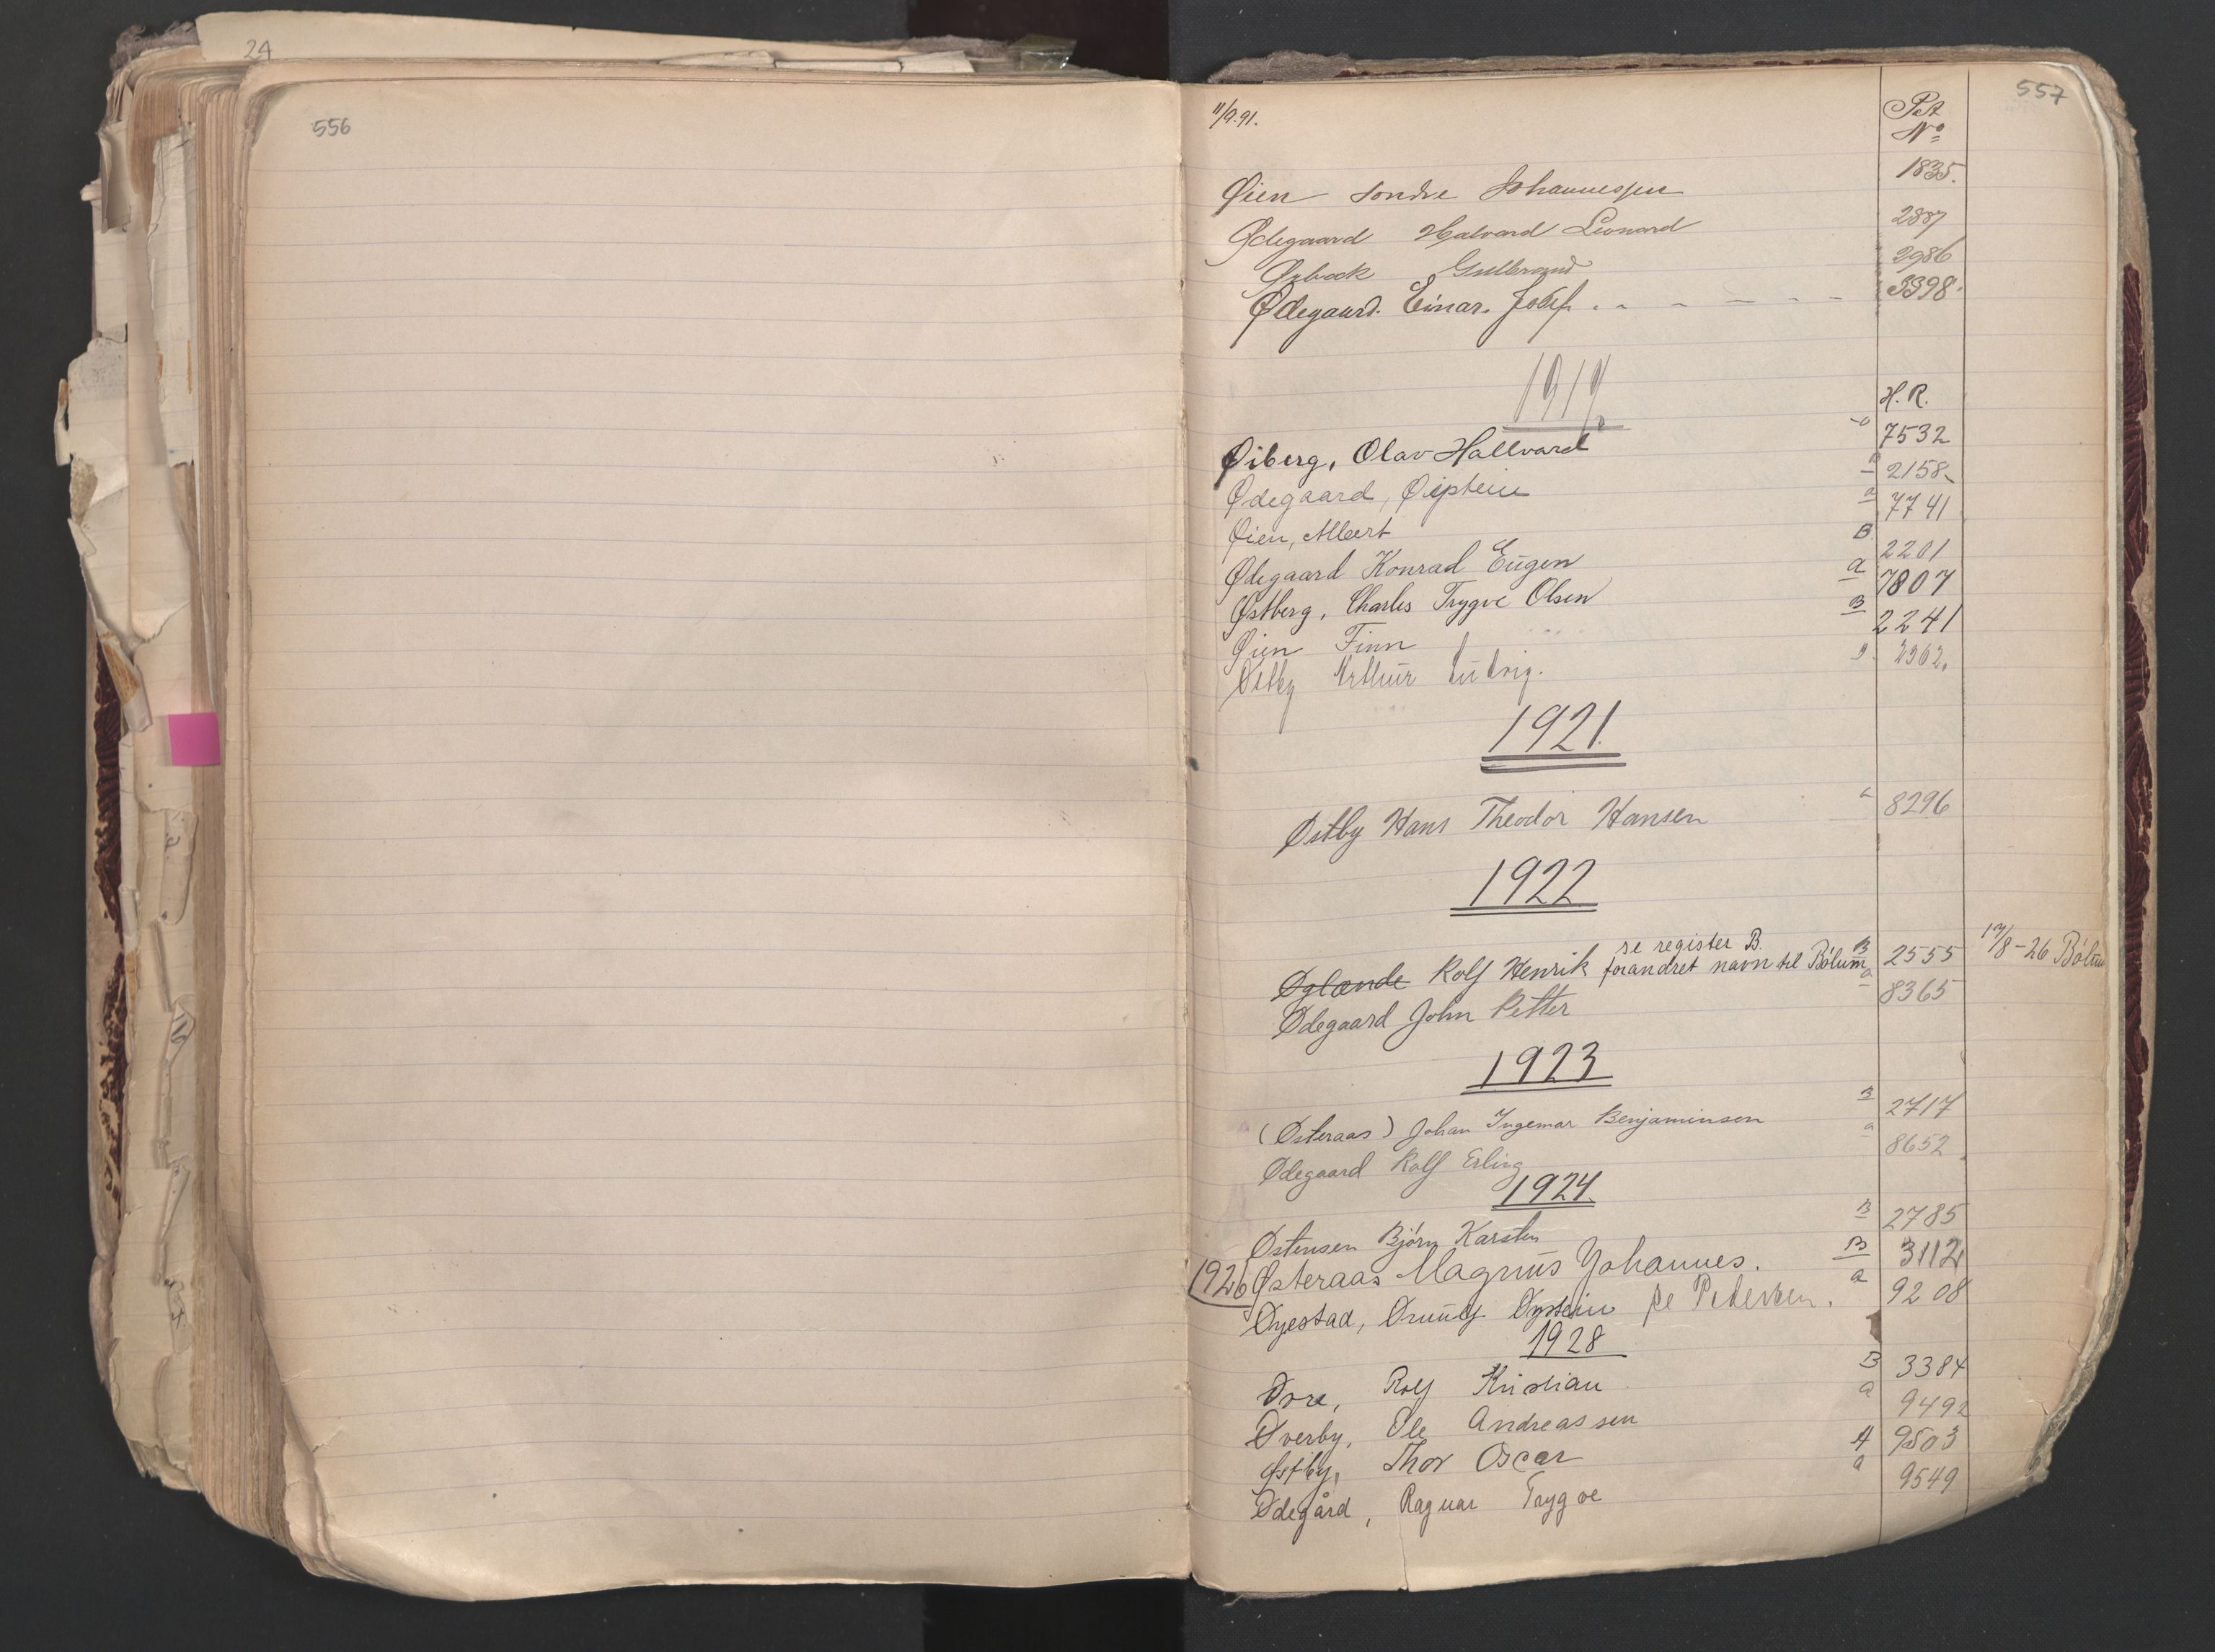 SAO, Oslo sjømannskontor, F/Fa/L0003: Register for Oslo mønstringskrets, 1891-1948, s. 556-557